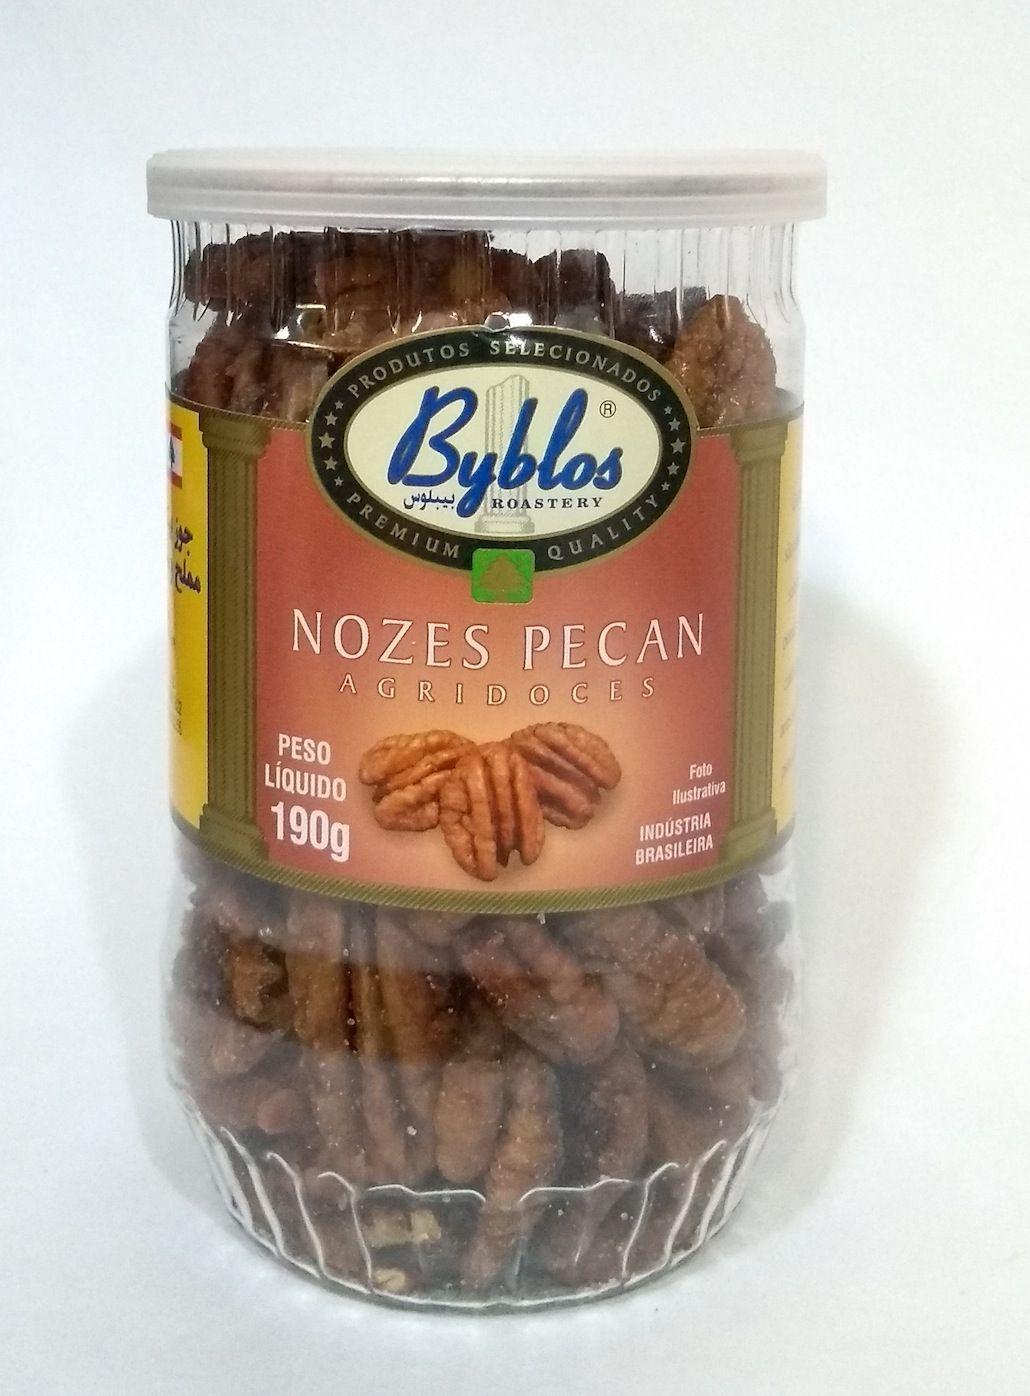 Nozes pecan agridoces, 190g - Byblos